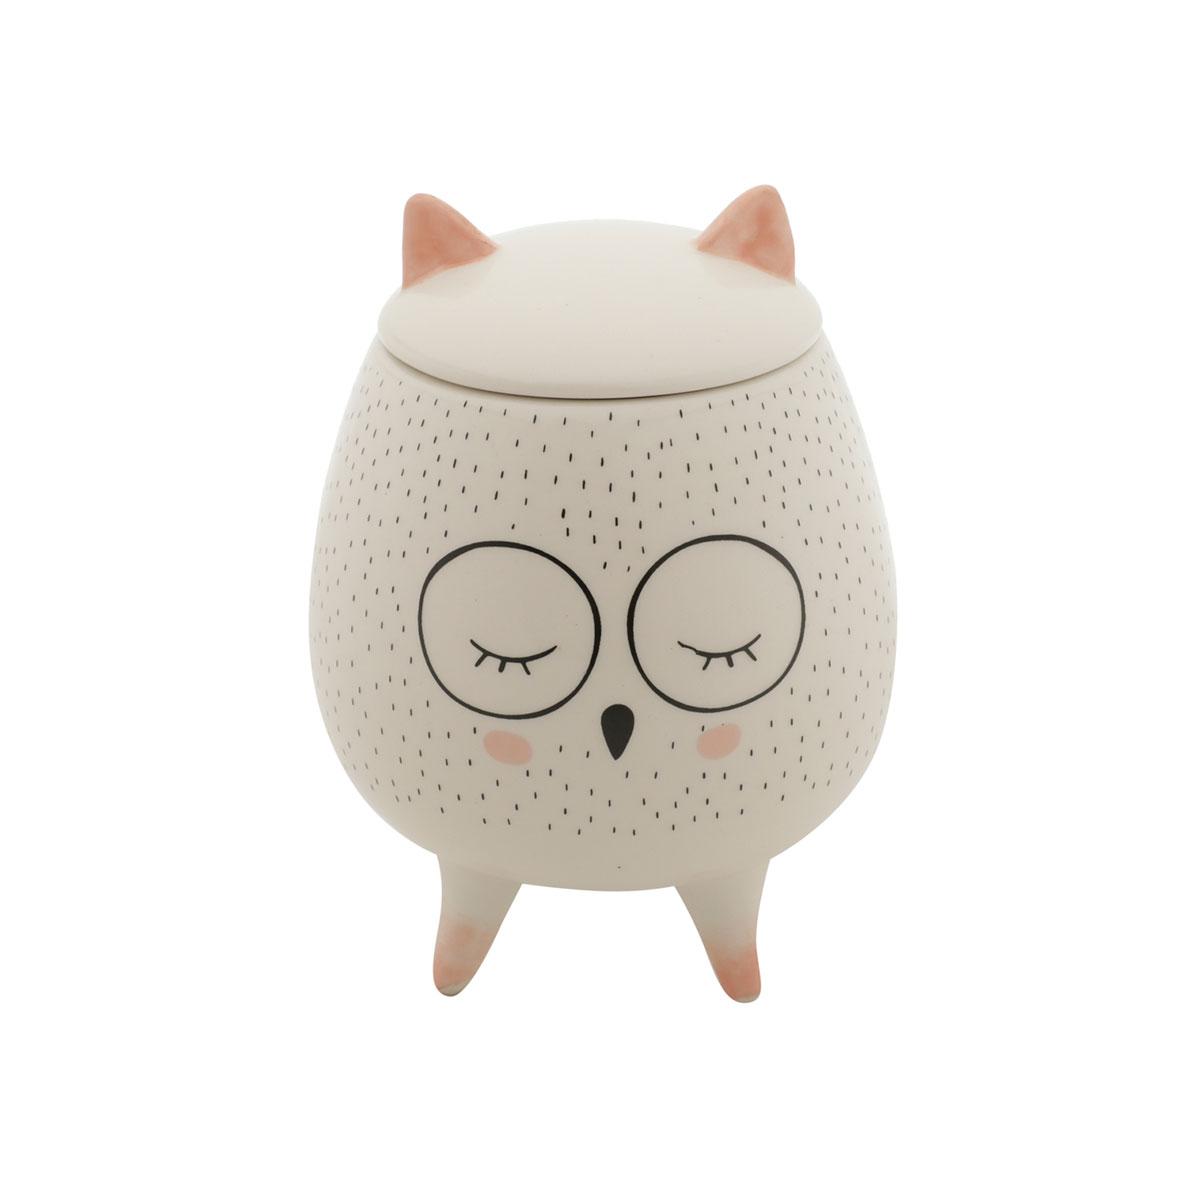 Vaso Potiche Decorativo Cerâmica Coruja Sleeping Owl - Presente Super